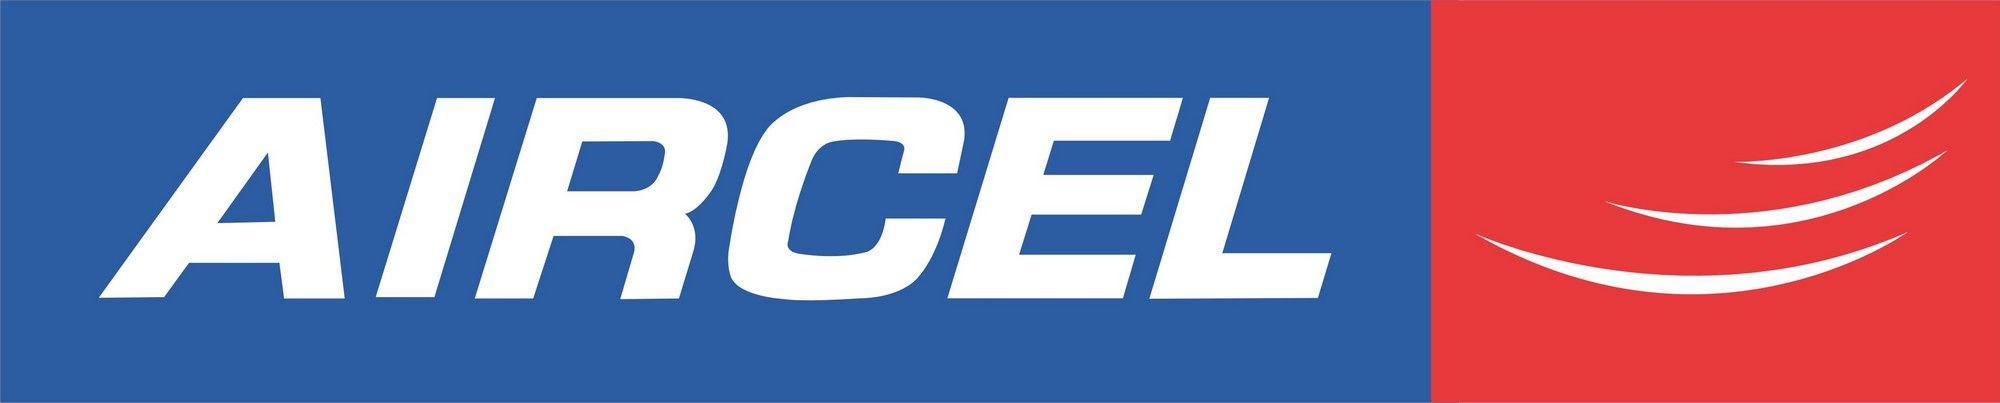 Aircel Logo [PDF] Vector EPS Free Download, Logo, Icons, Brand Emblems